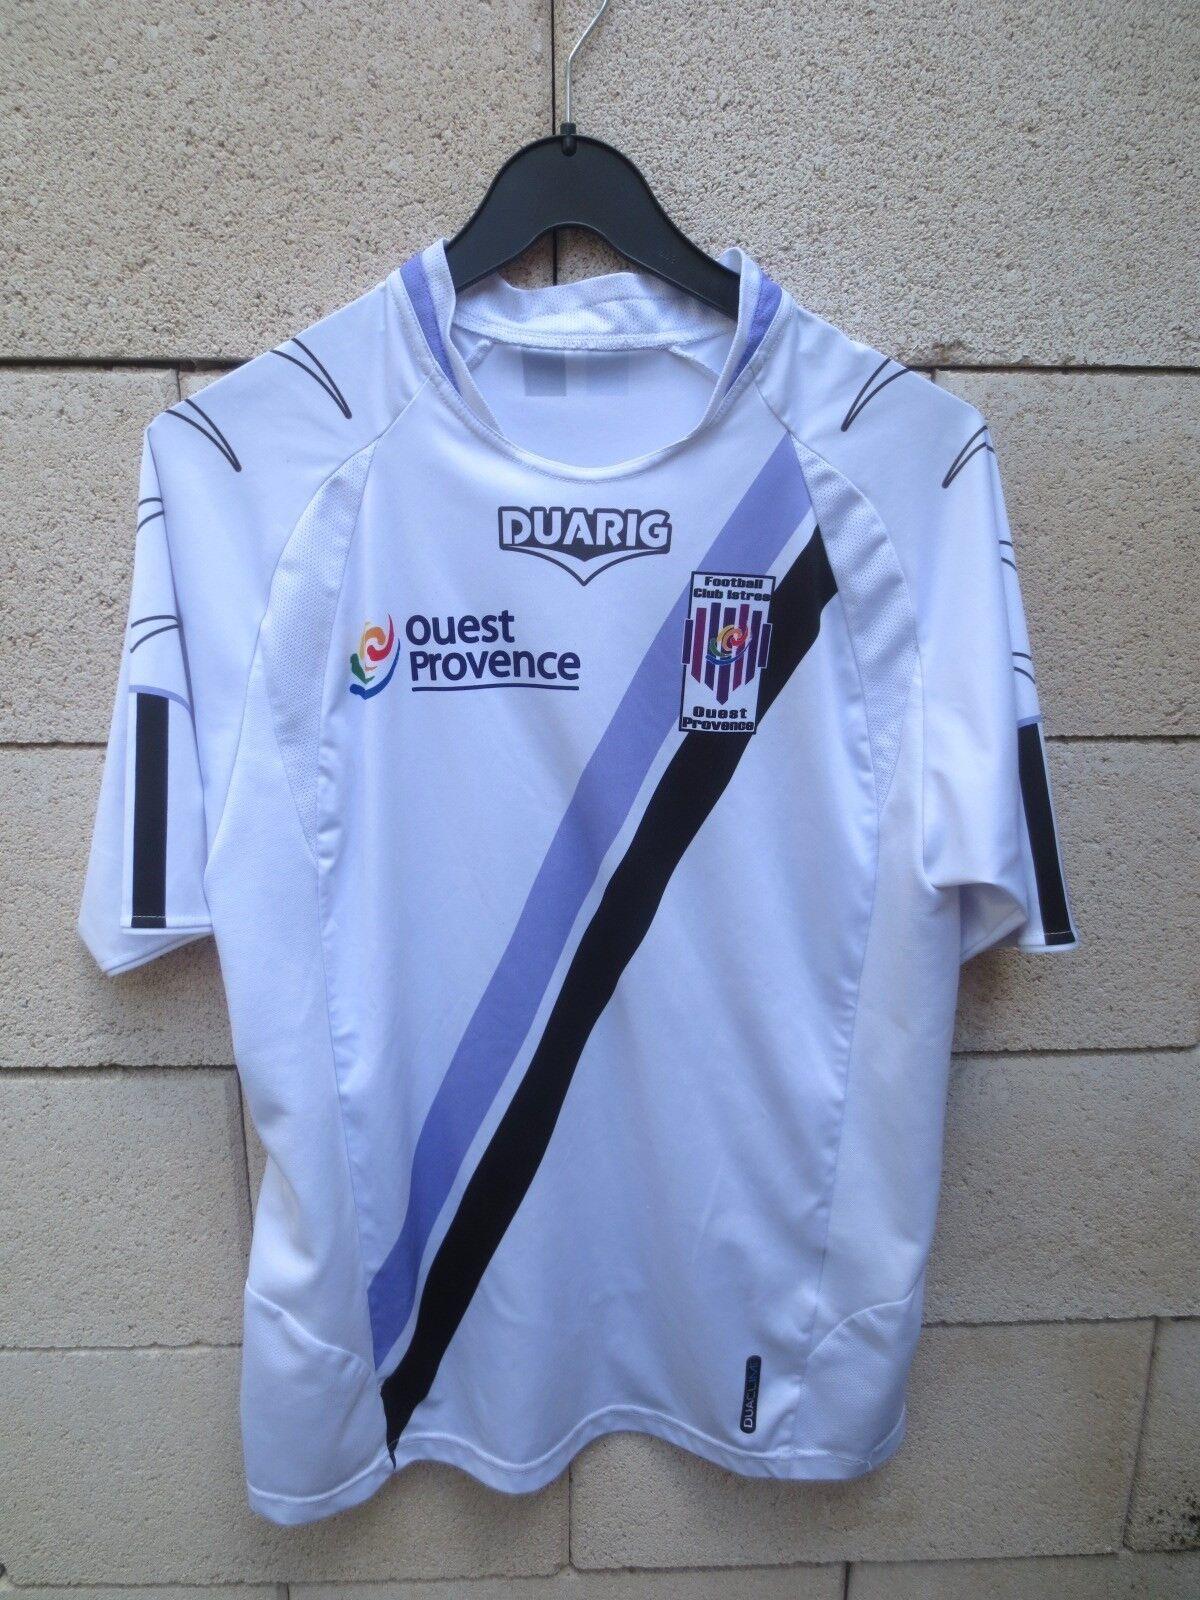 Maillot F.C ISTRES DUARIG football football DUARIG away shirt DUACLIM trikot maglia camiseta M 6b7f29